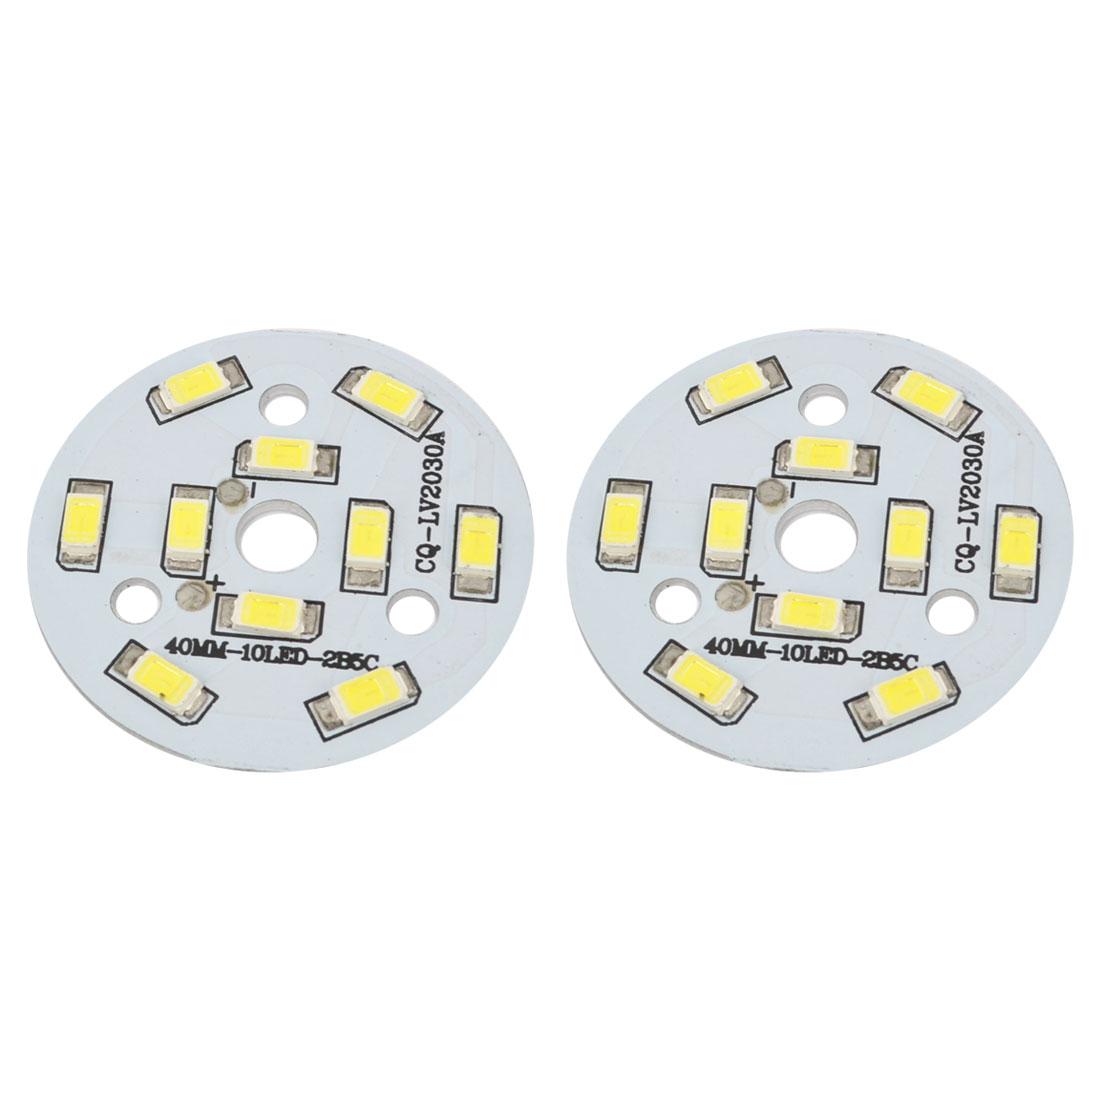 50-60LM 5W White 10x 5730 SMD LED + 40mm Aluminum PCB Circuit Board 2Pcs